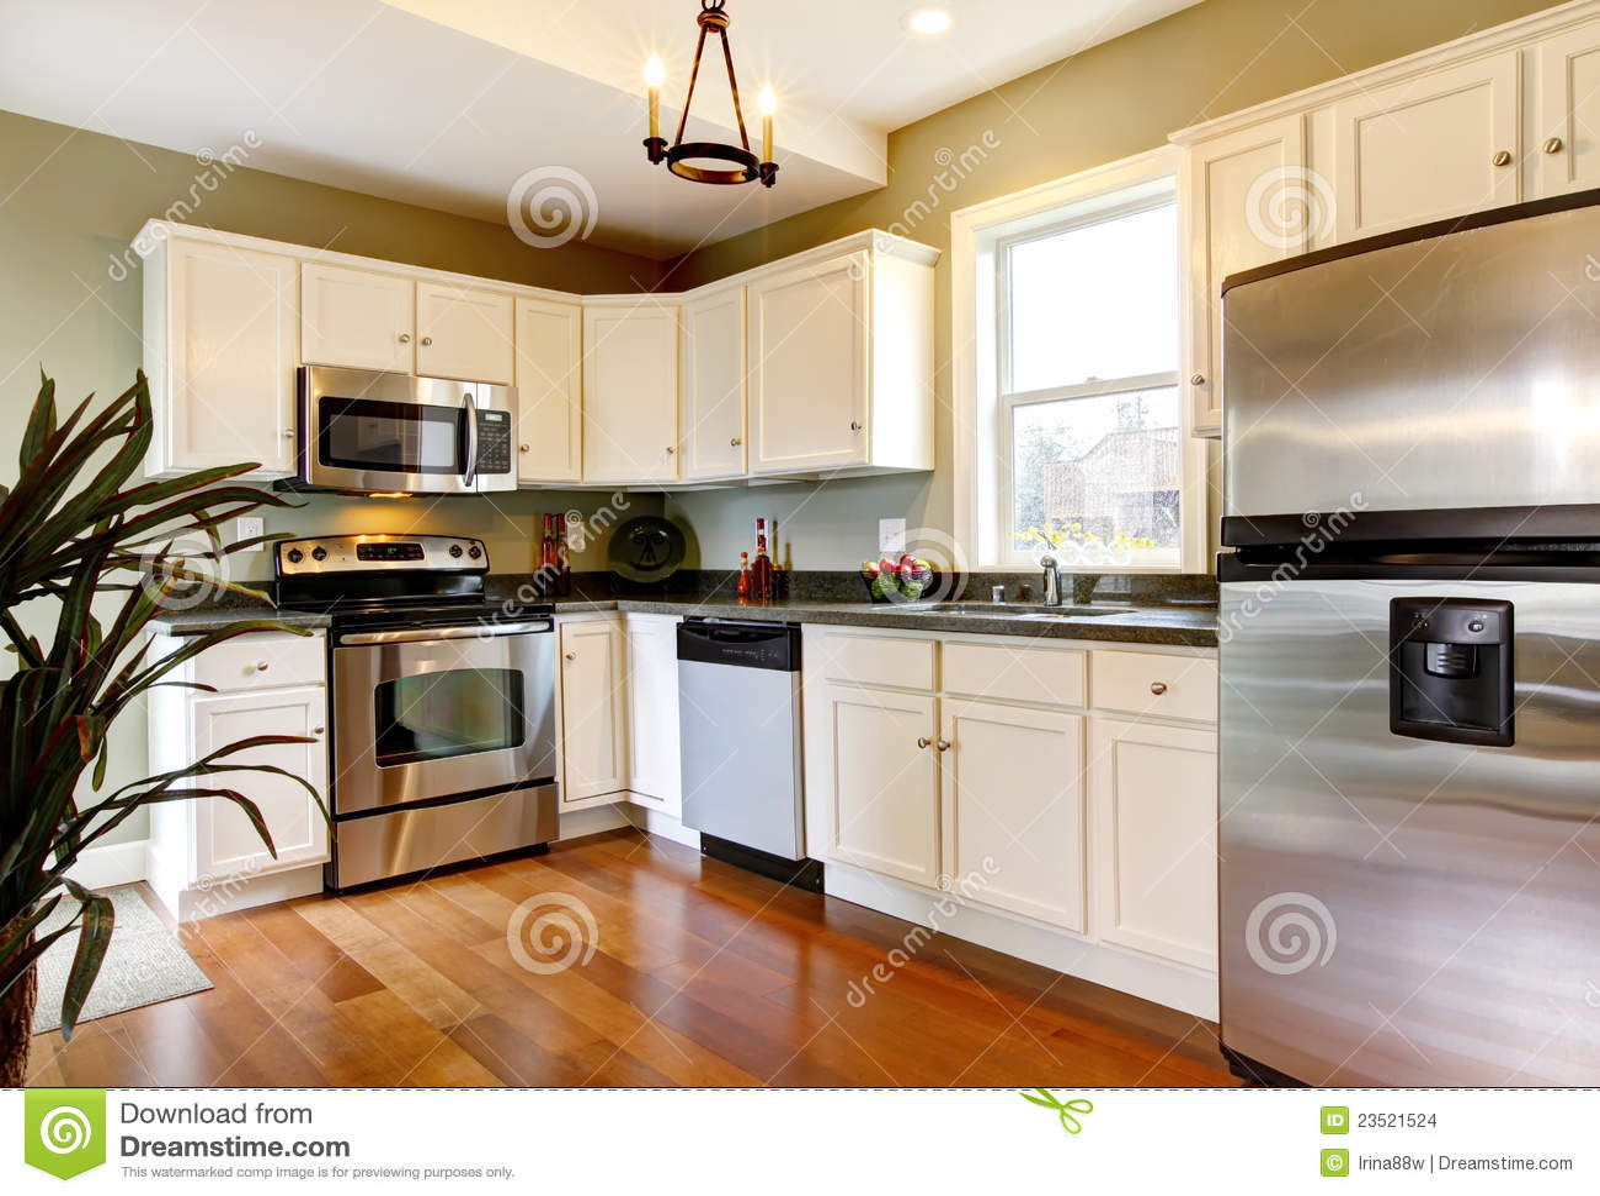 Cuisine neuve blanche et verte classique images stock image 23521524 for Cuisine blanche classique